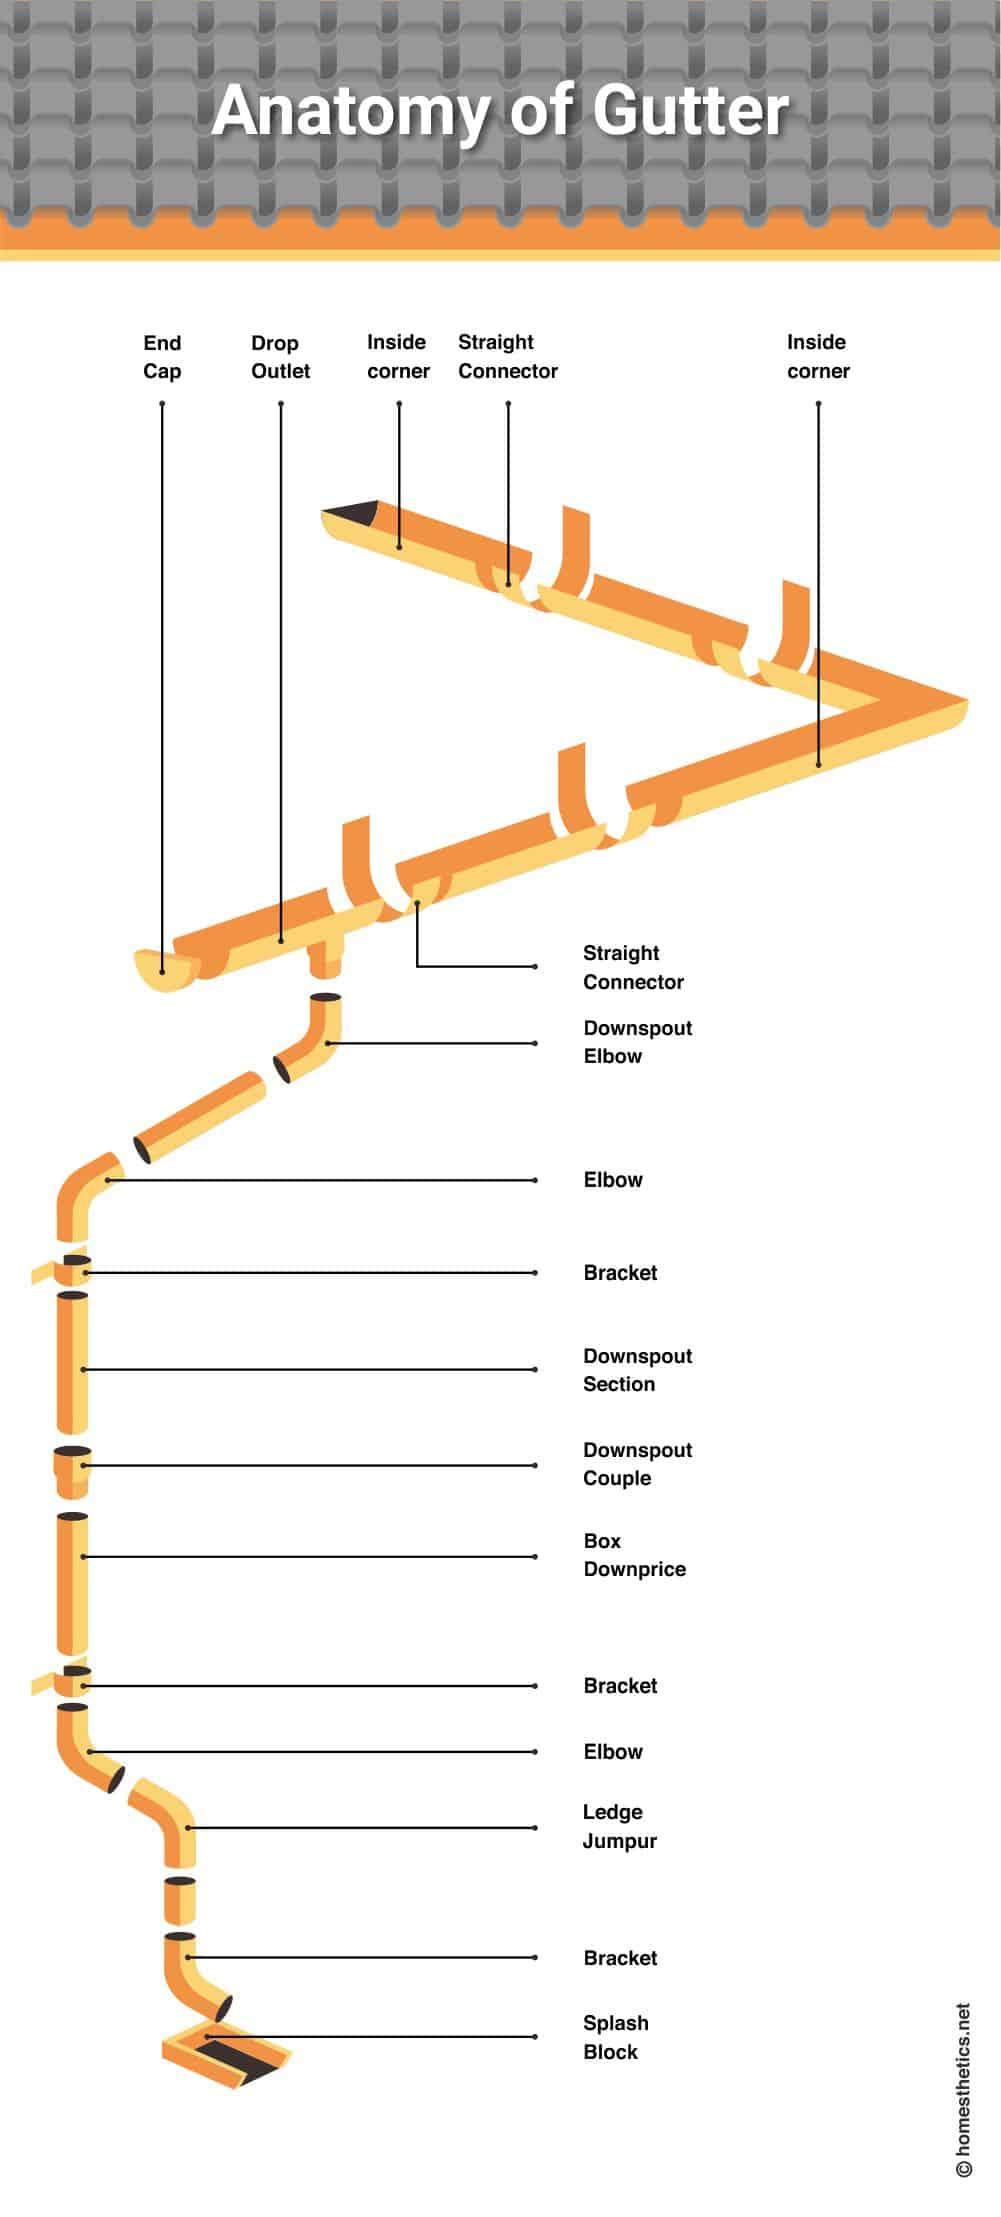 1 anatomy of gutter